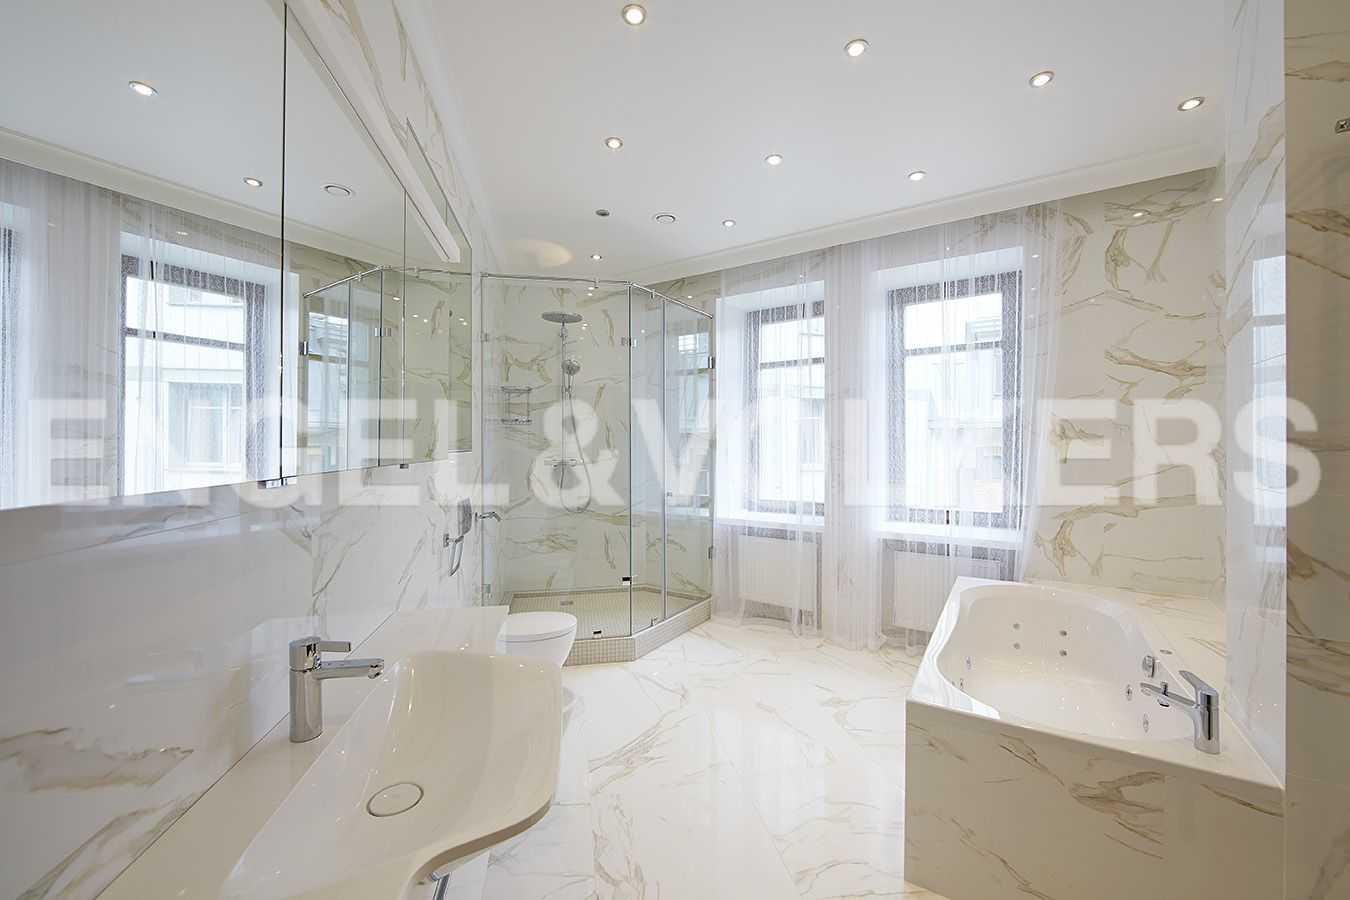 Элитные квартиры на . Санкт-Петербург, 2-ая Березовая аллея, 13-15. Ванная комната